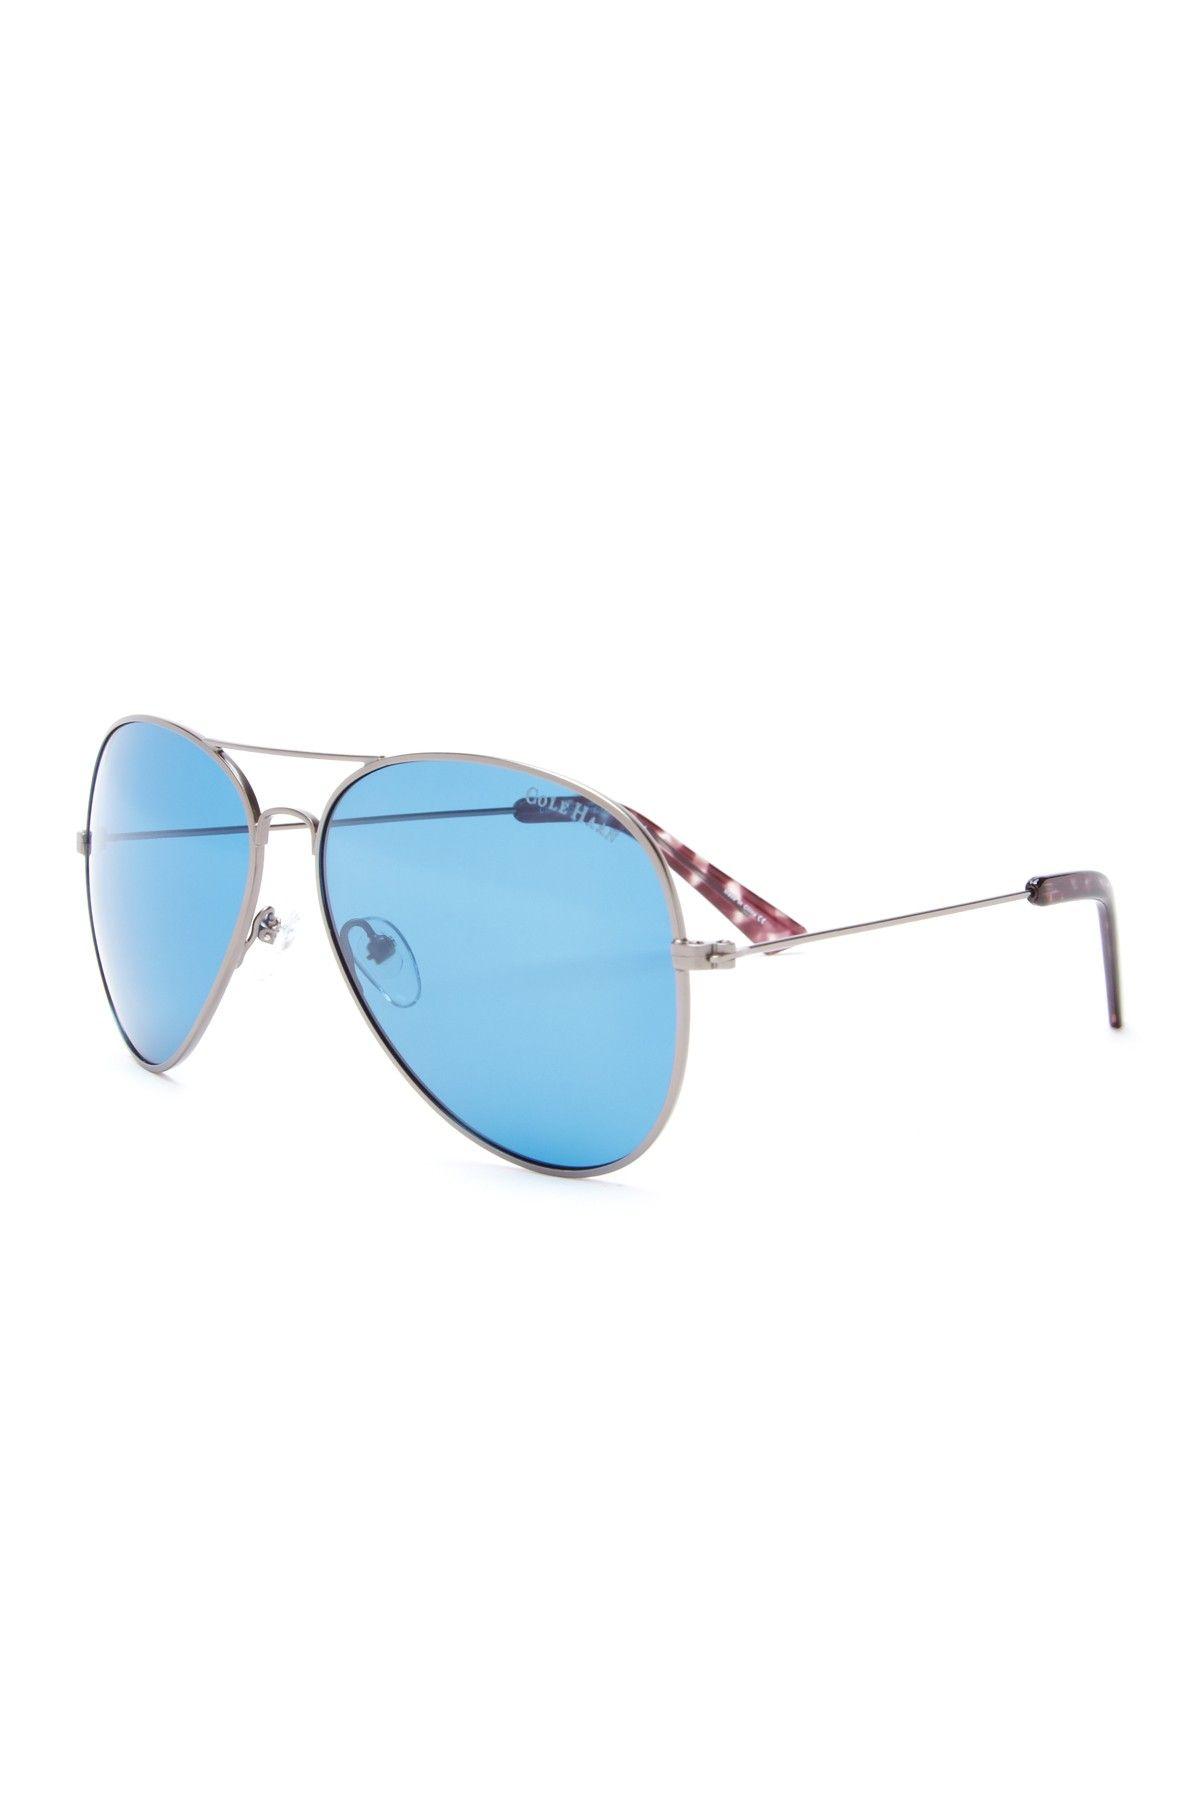 f4a61bcd2f858 Cole Haan Sunglasses Womens Metal Aviator Sunglasses  3